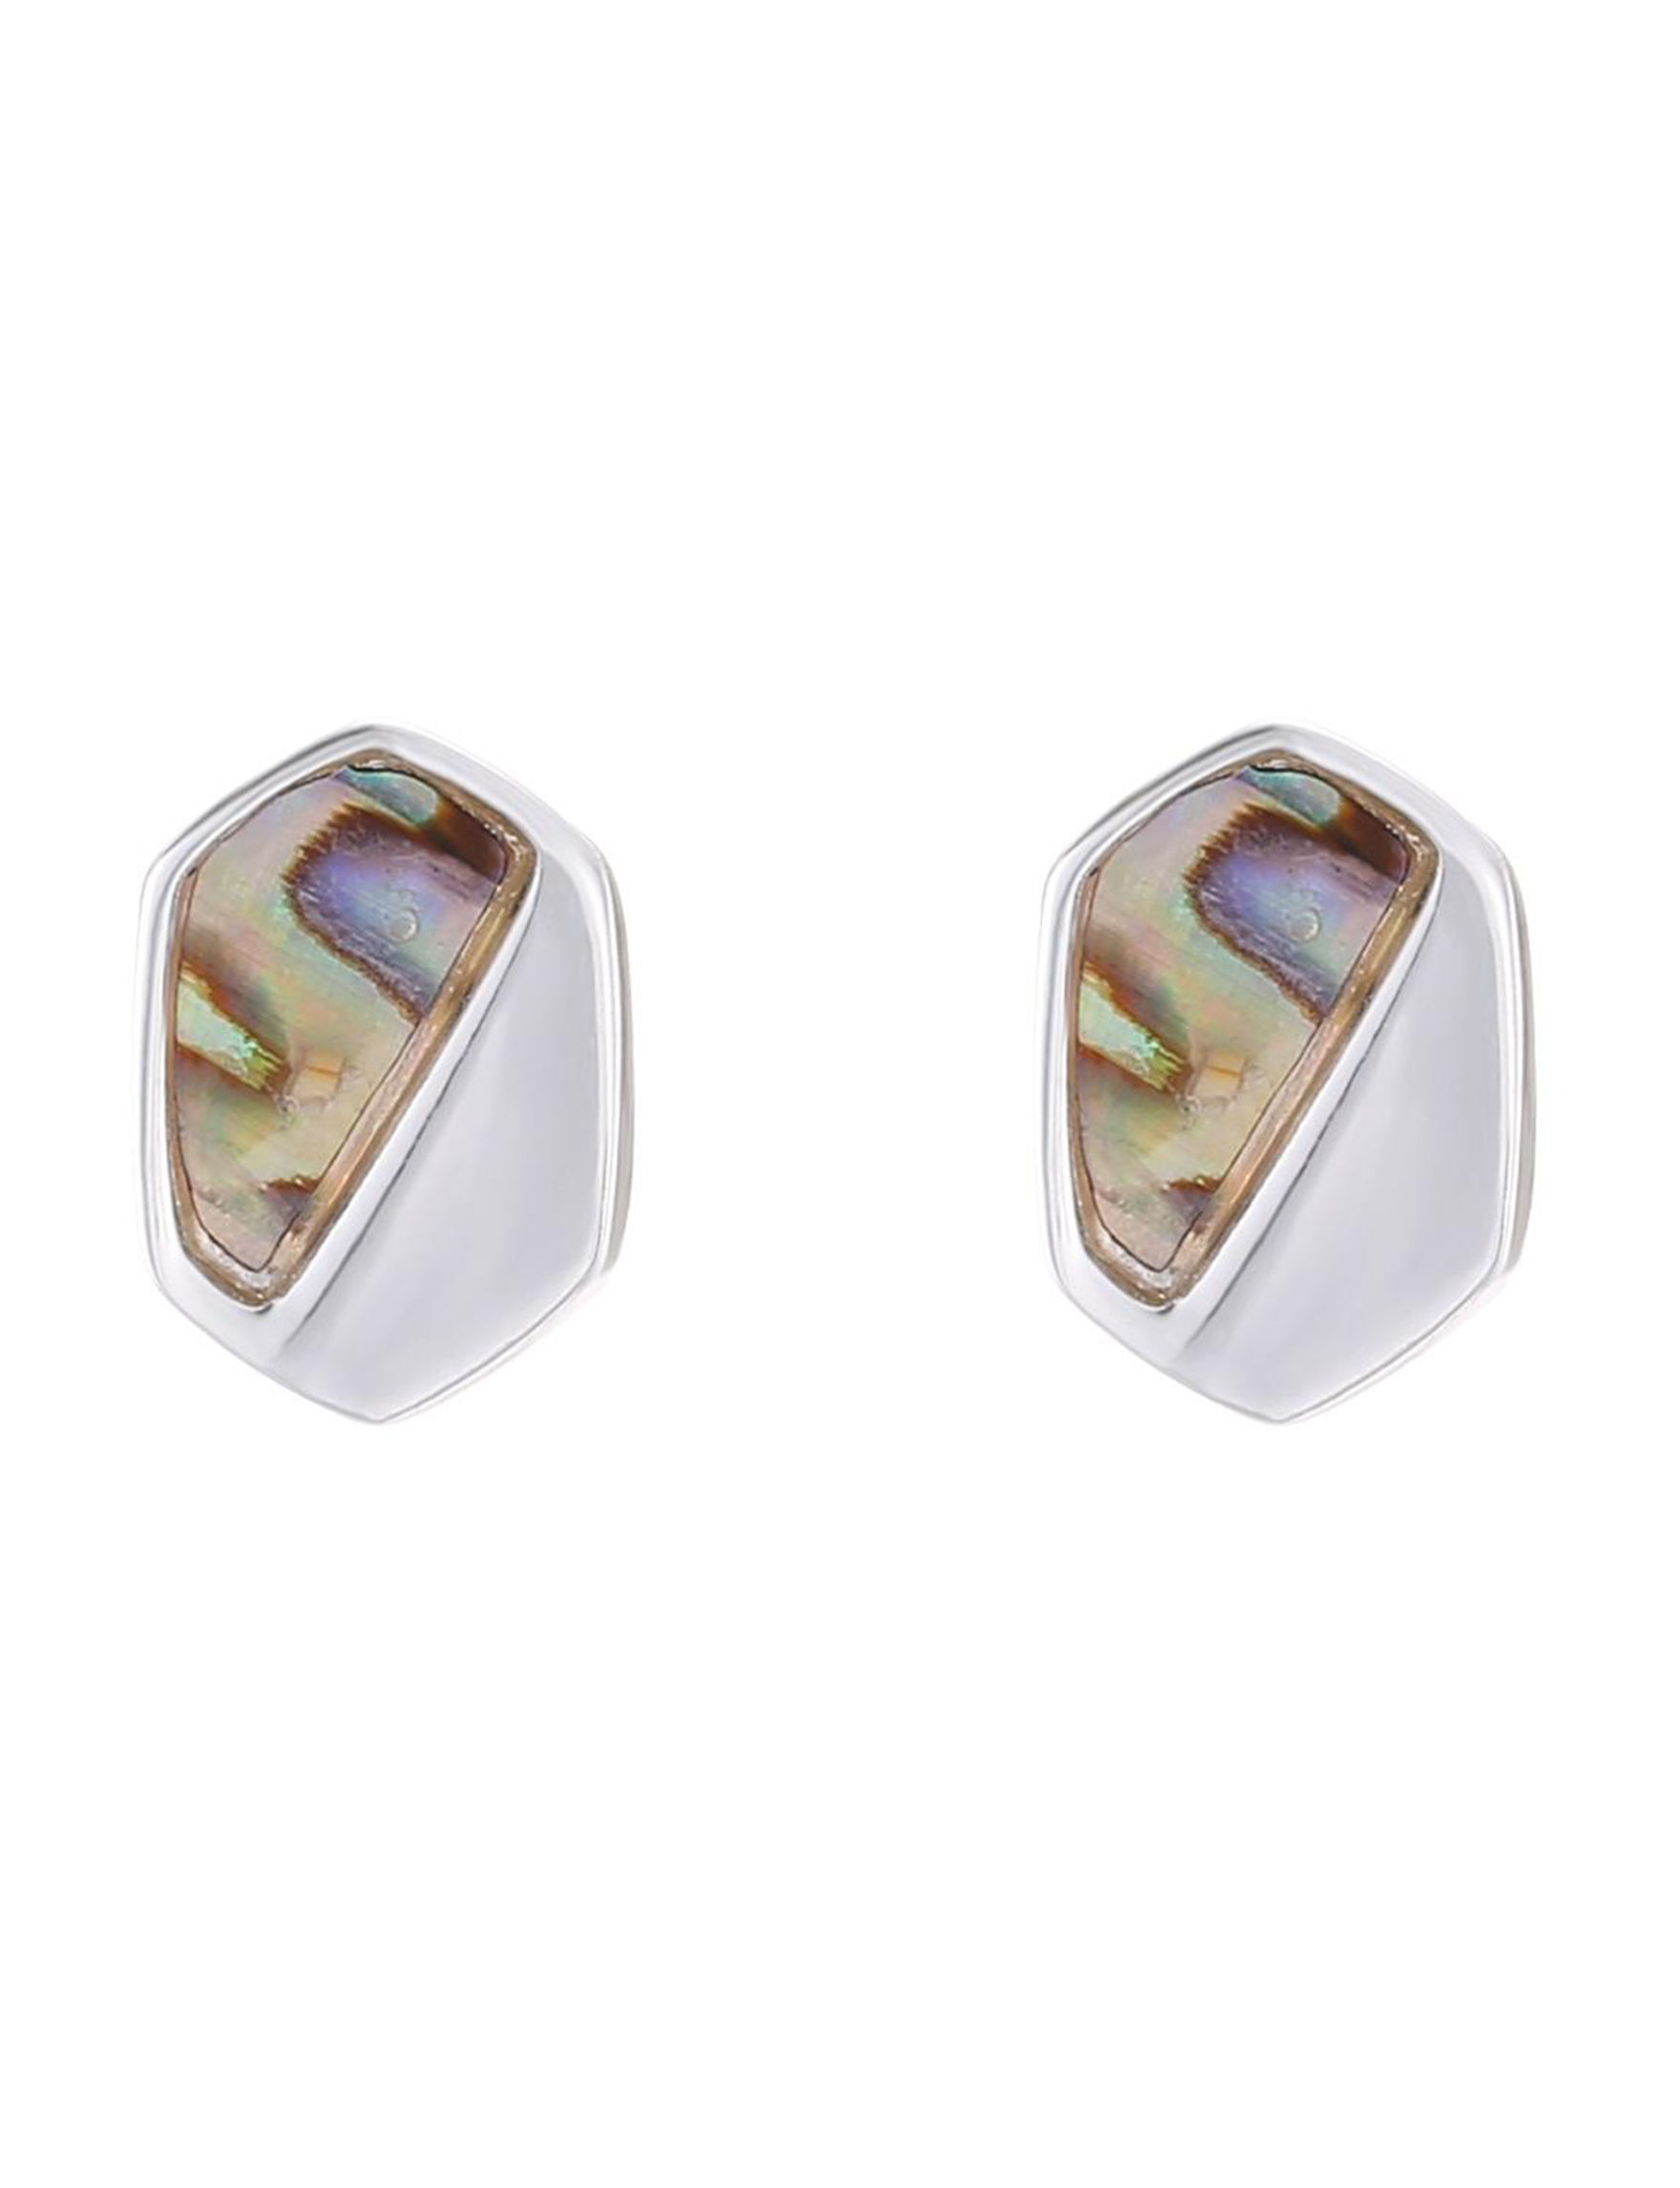 Chaps White / Abalone Studs Earrings Fashion Jewelry